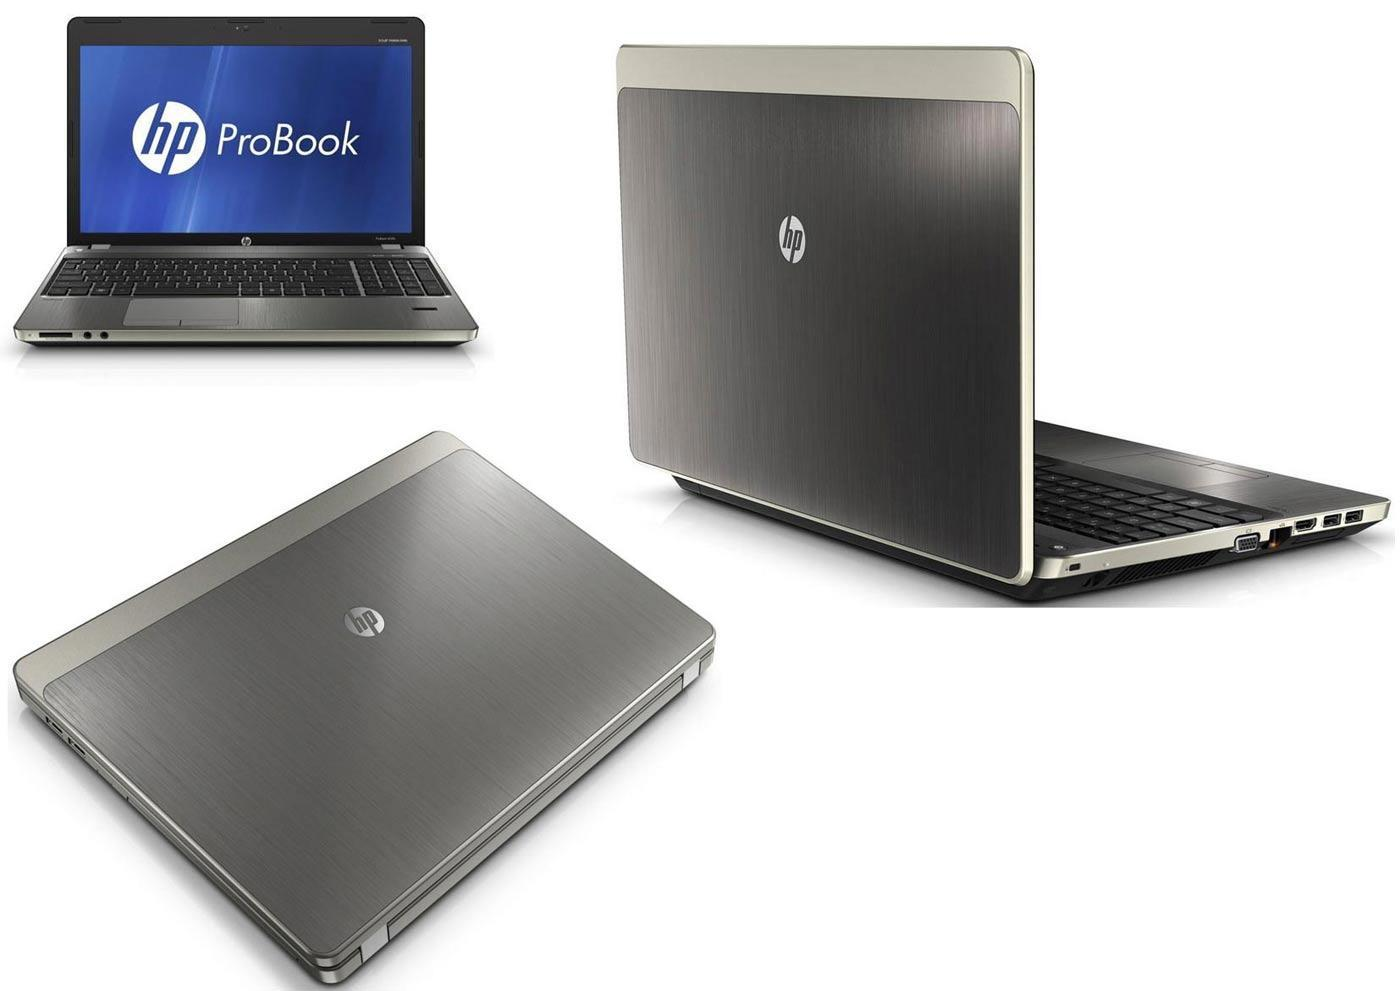 Laptop HP ProBook 4730s (Core i5-2520M, RAM 4GB, HDD 250GB